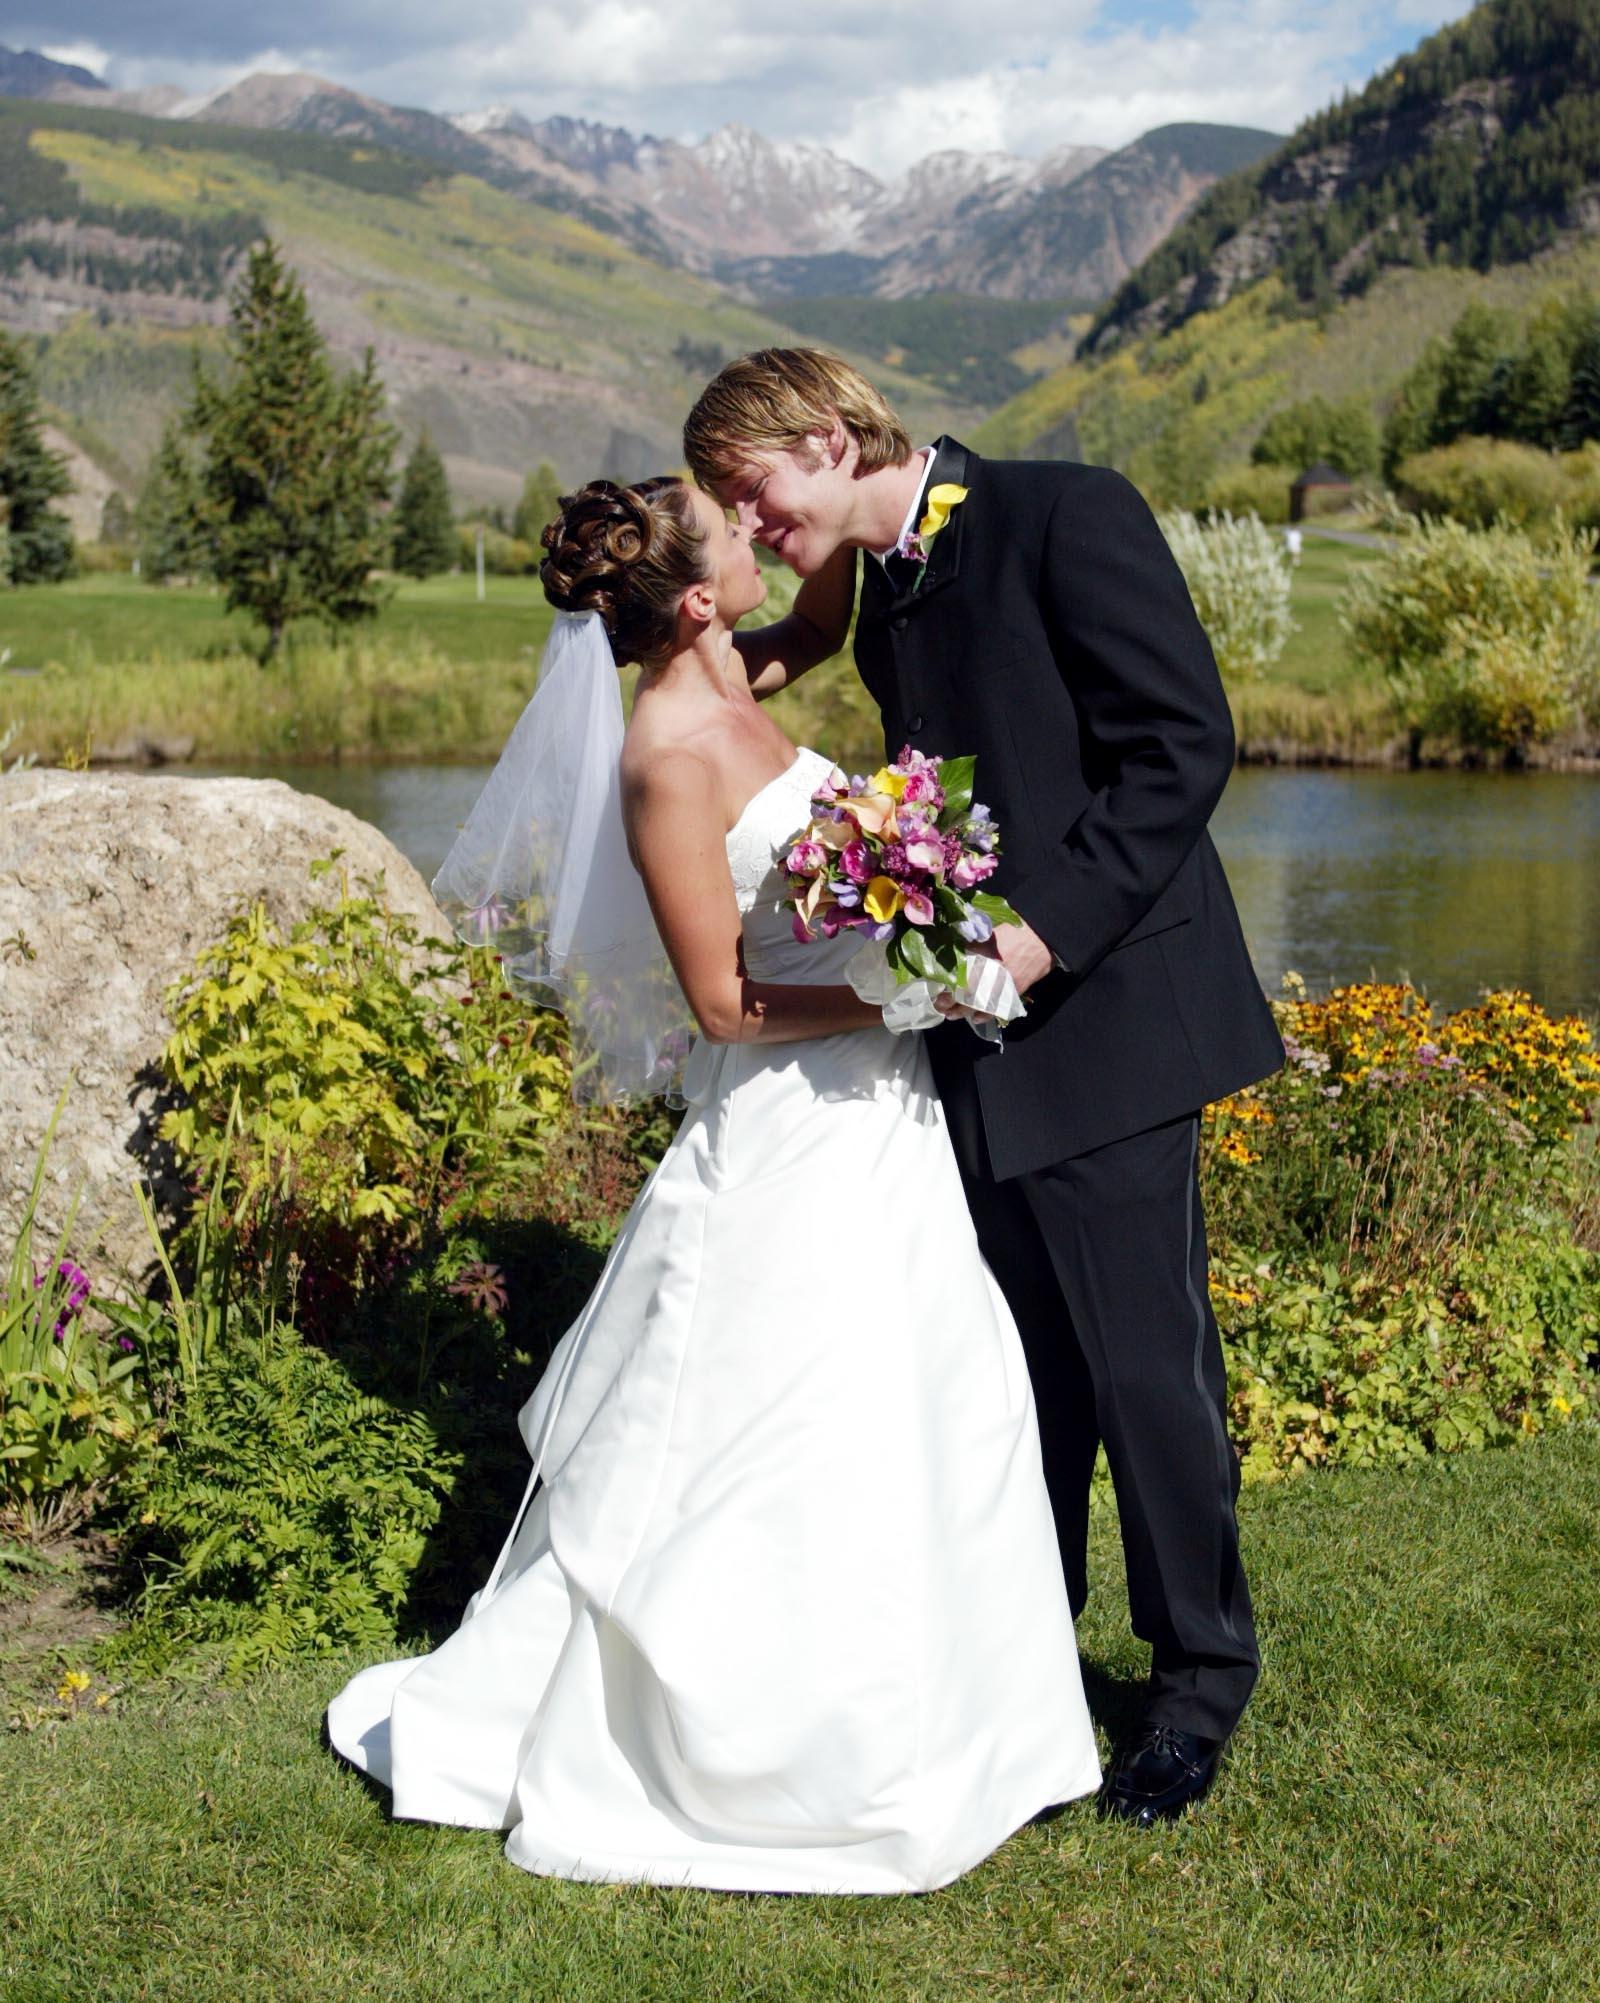 Vail-golf-course-weddings-axelphoto.JPG